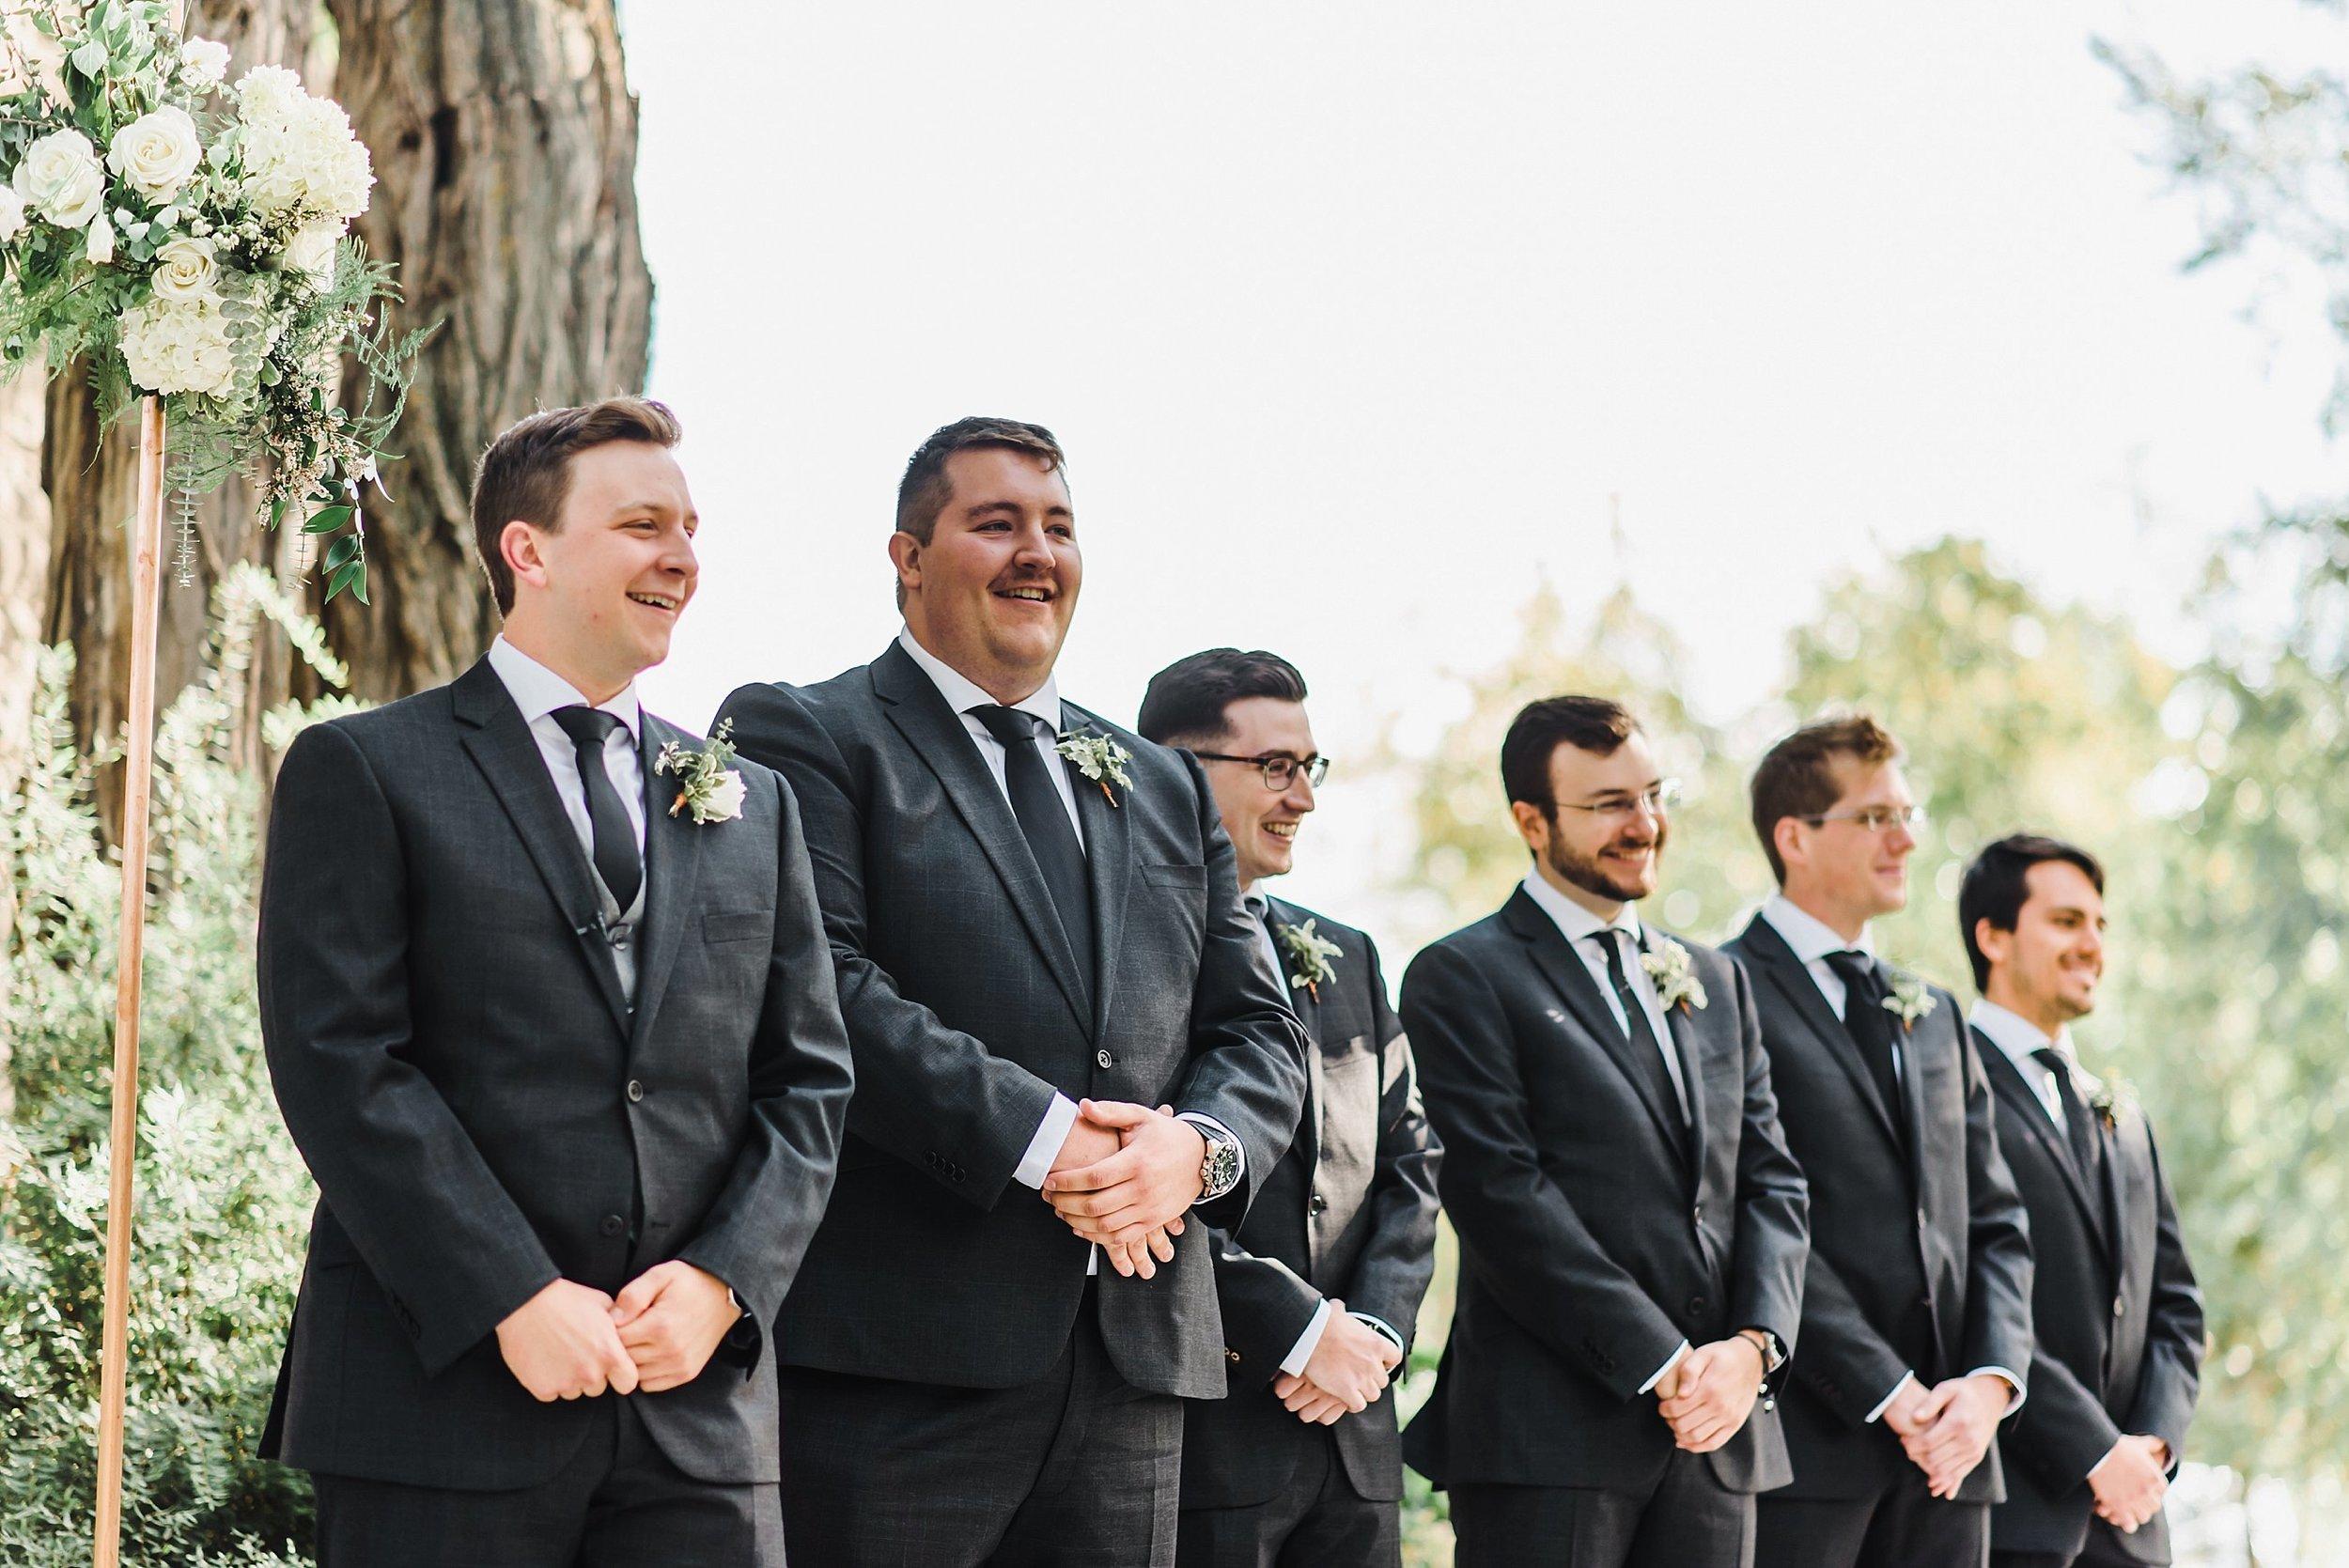 light airy indie fine art ottawa wedding photographer | Ali and Batoul Photography_1144.jpg